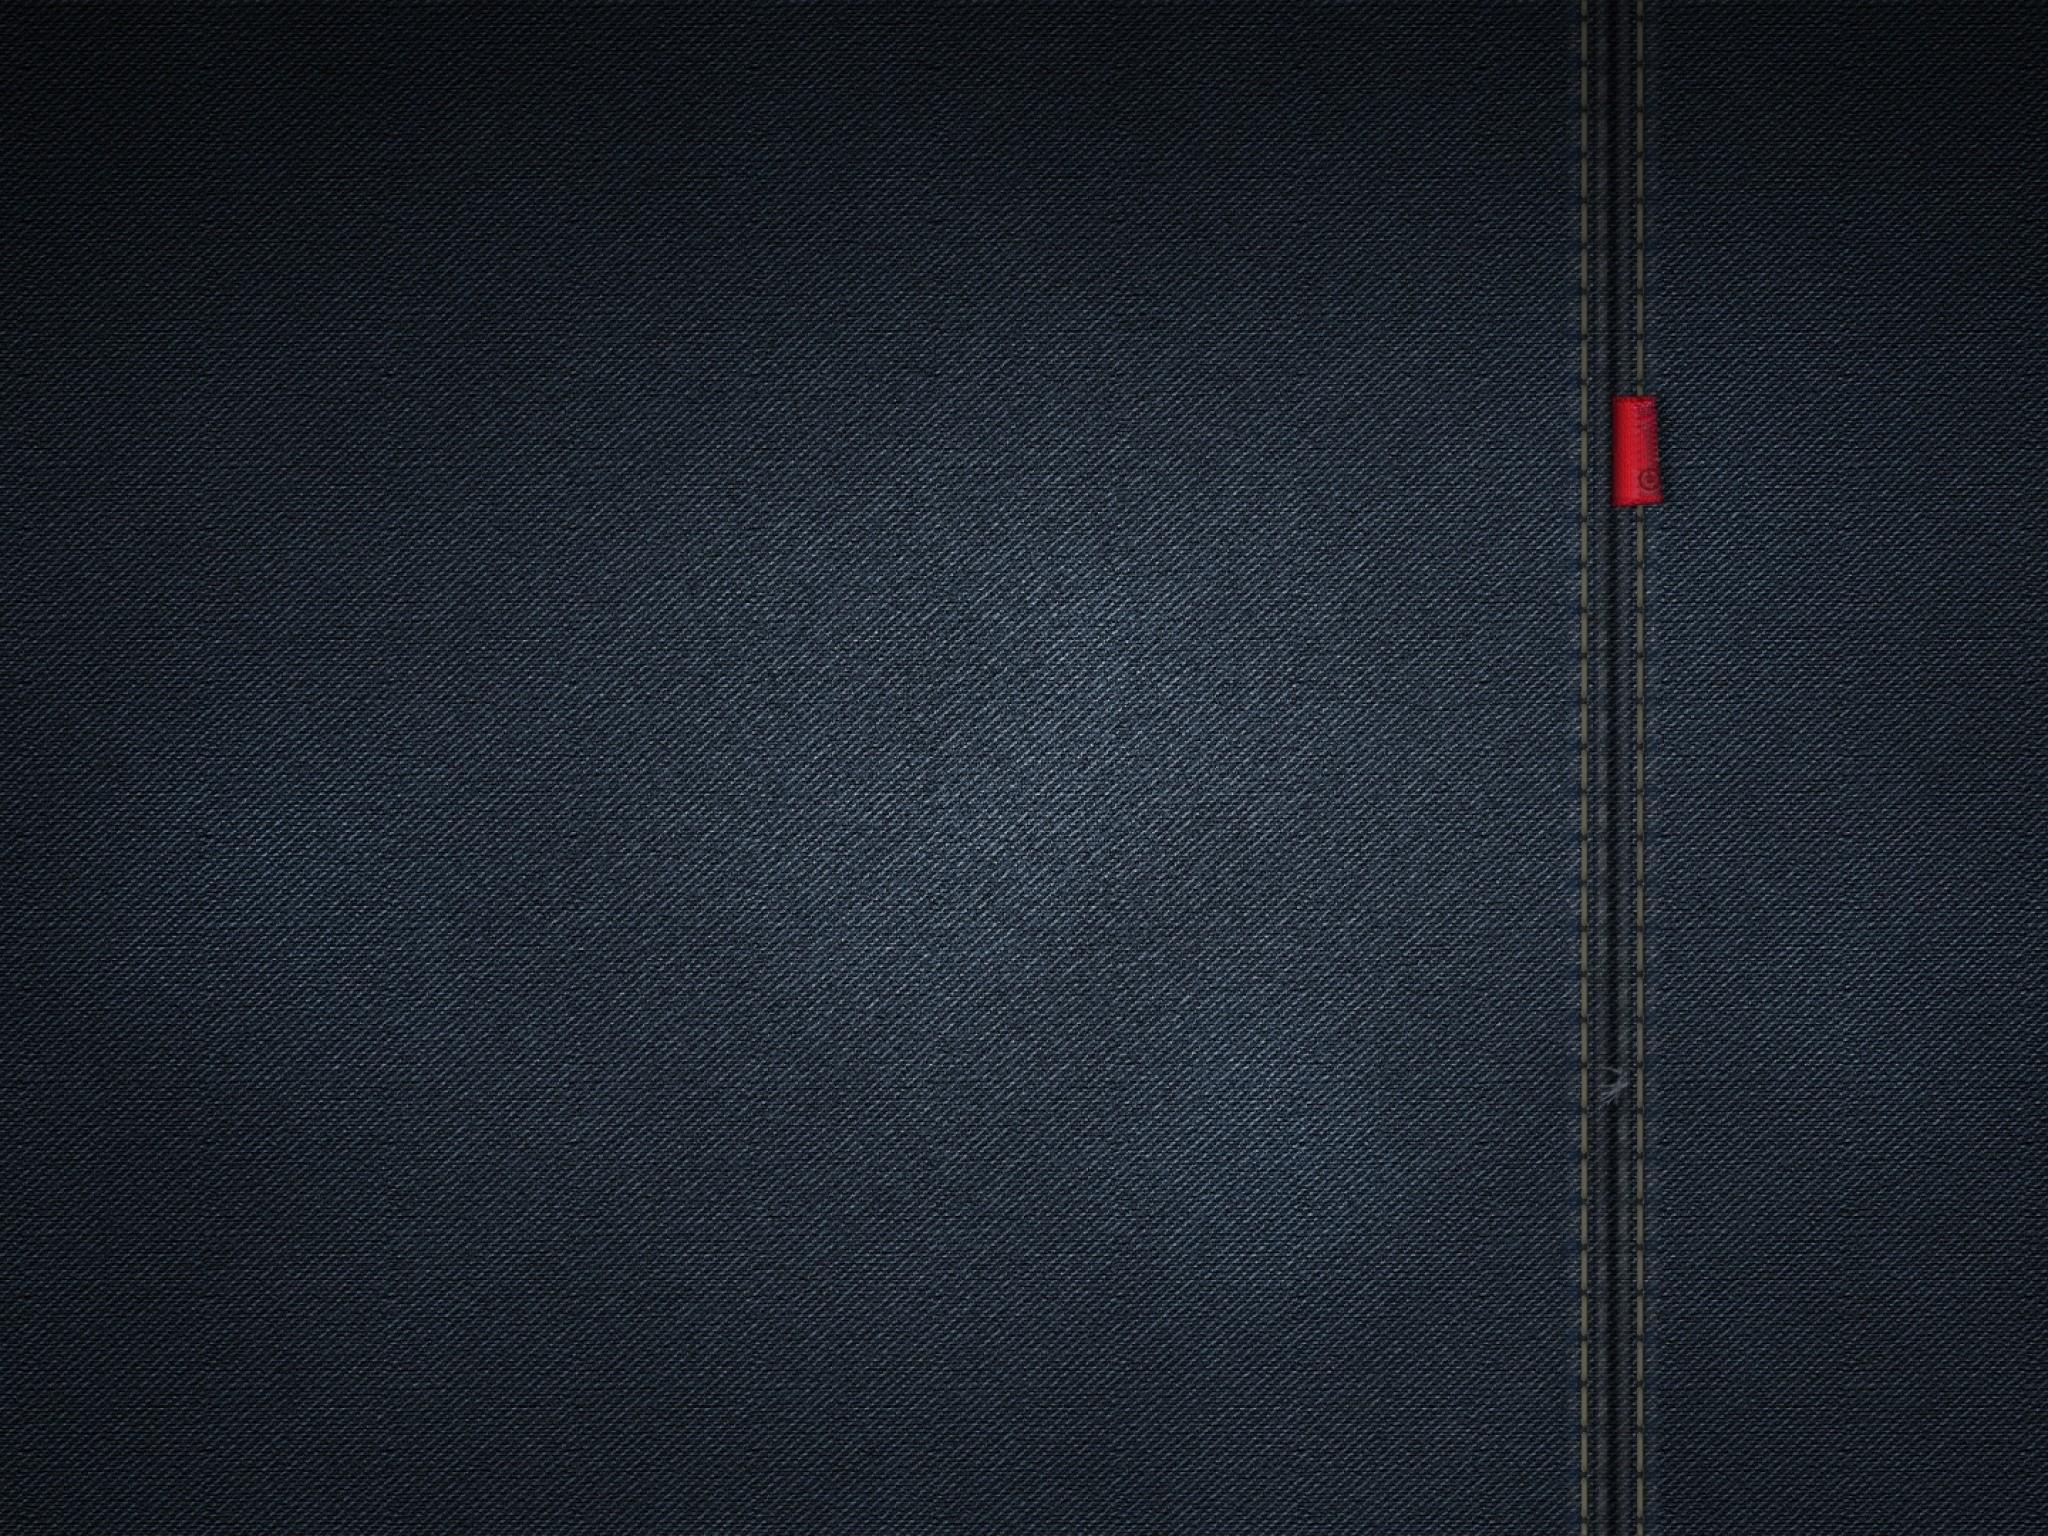 30 De Wallpaper Uri Retina Pentru Iphone Ipod Touch Ipad: 20 Wallpaper-uri Retina Pentru IPhone, IPod Touch Si IPad